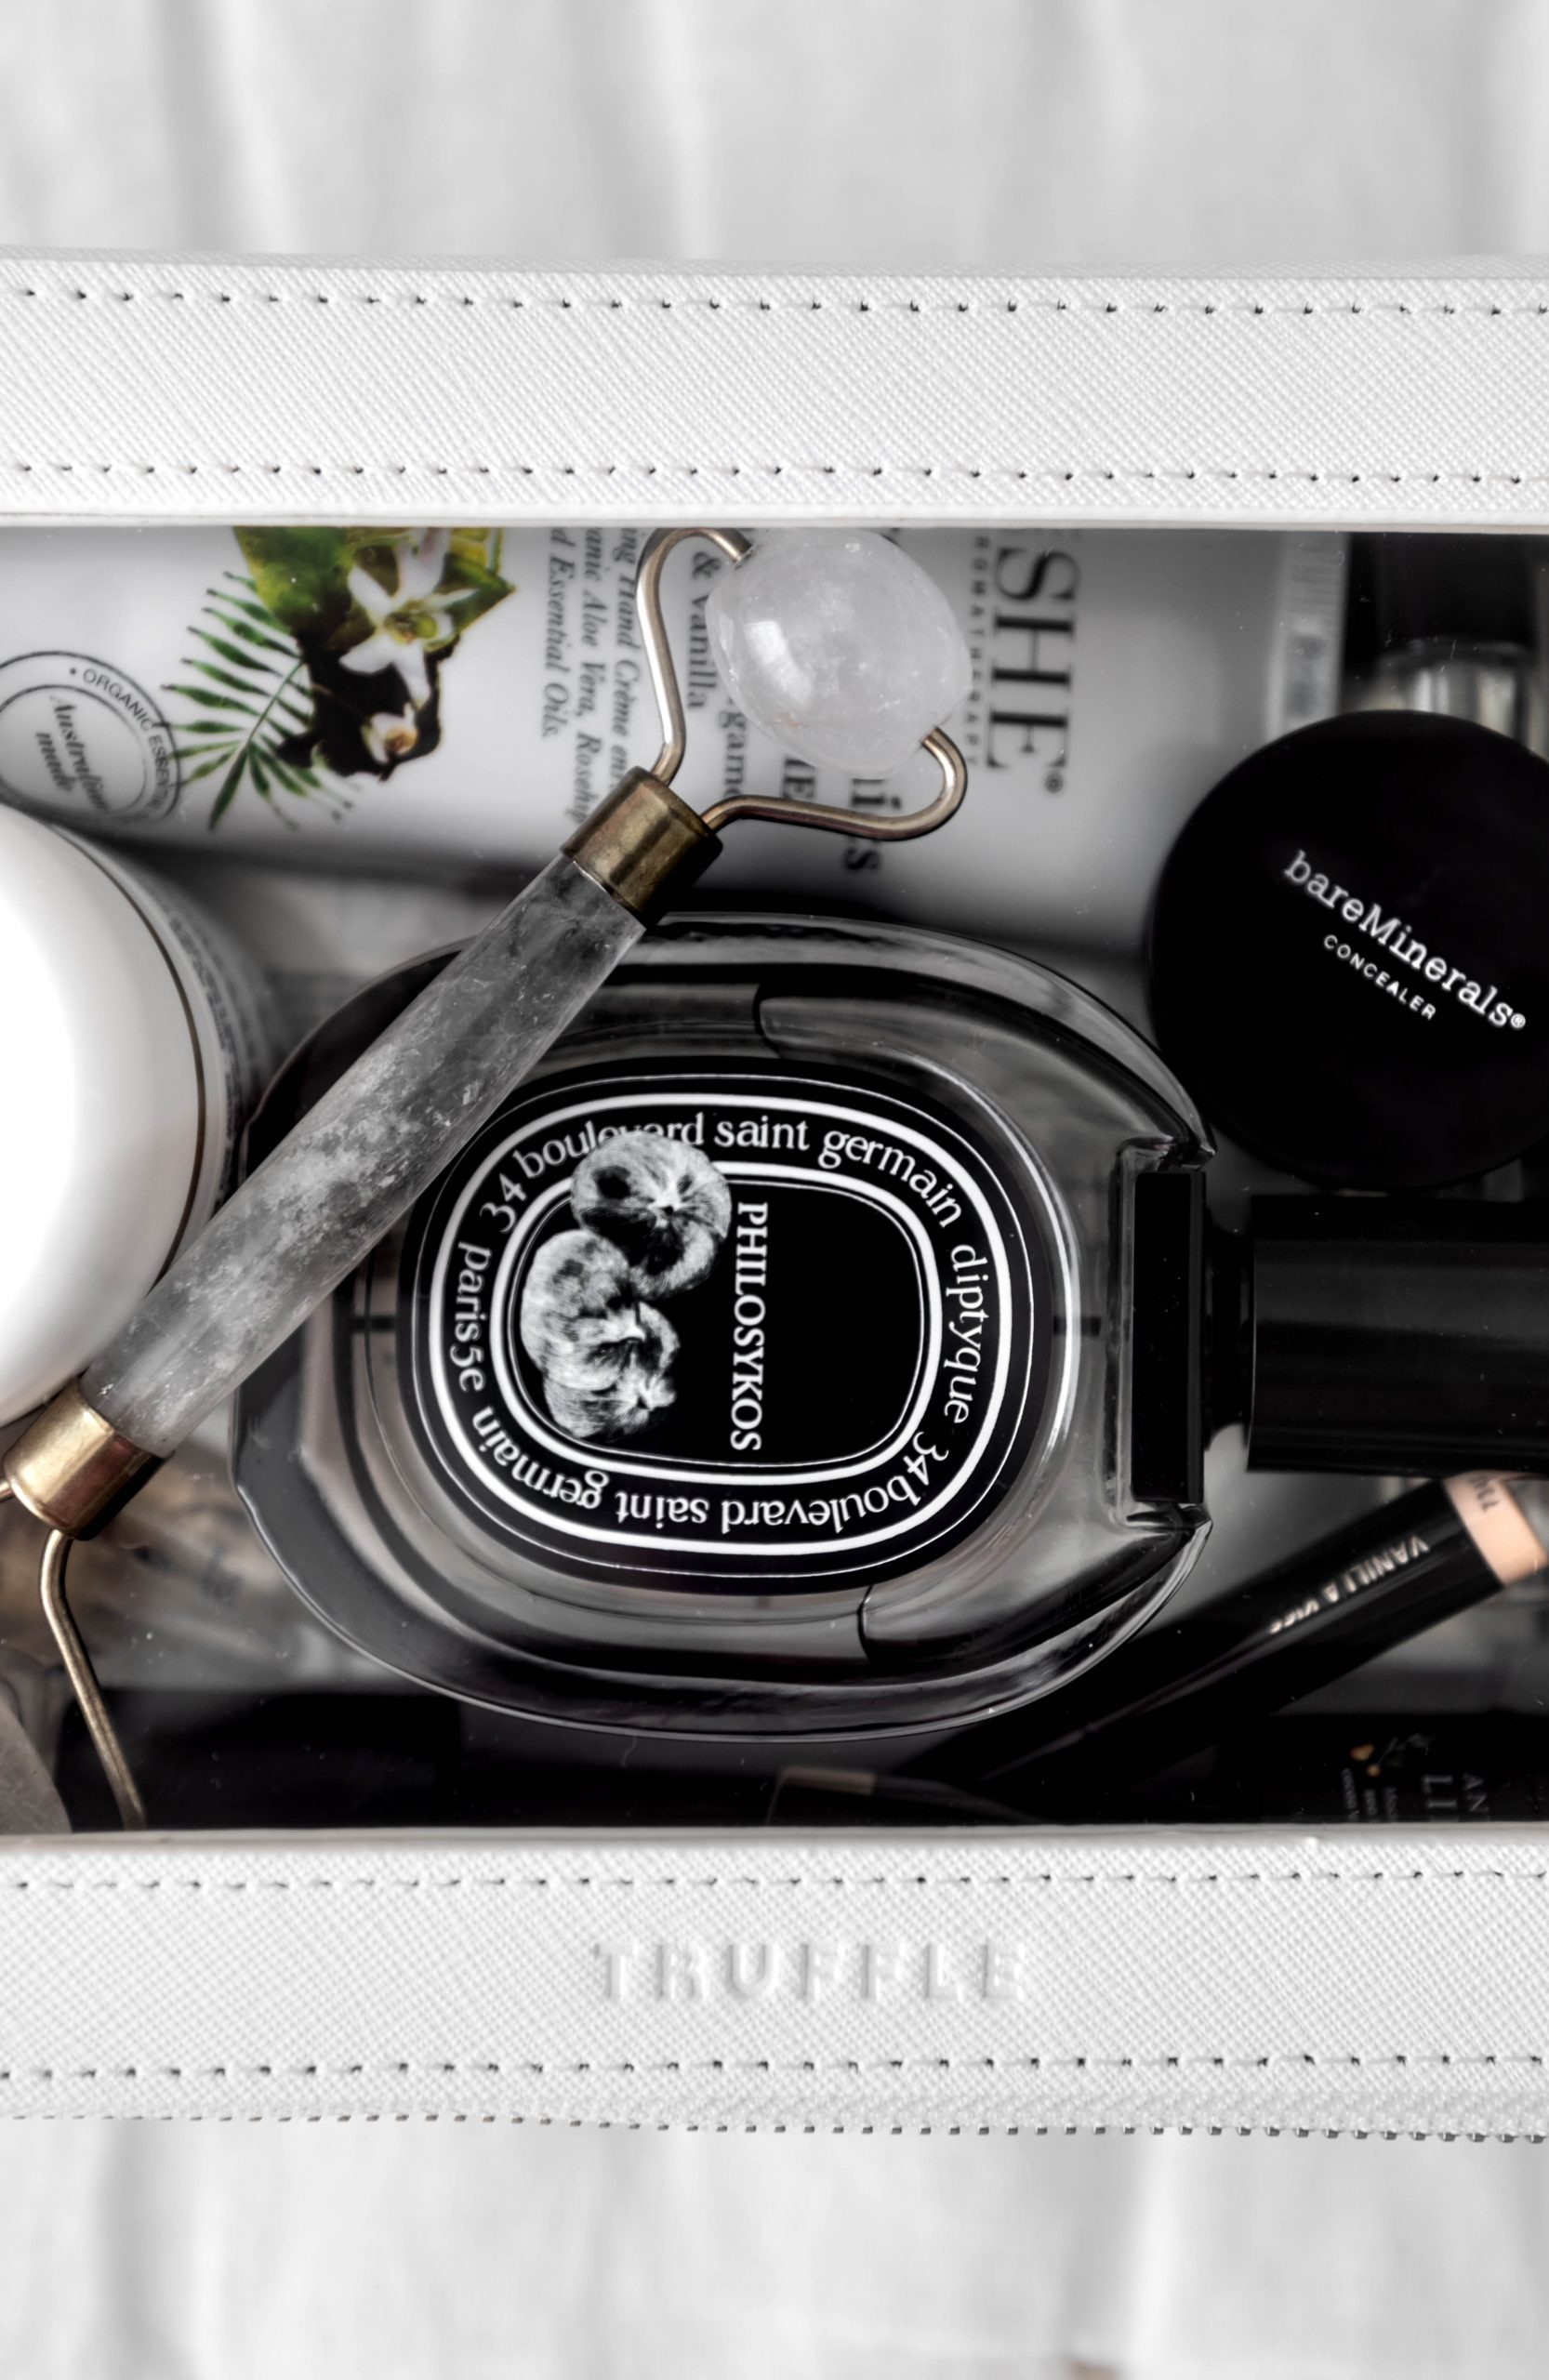 How I Pack My Cosmetics When I Travel Using Truffle Diptyque Perfume Bare Minerals Concealer Biologique Recherche Creme Verte Espoir, Annmarie Cosmetics Resorative Manuka Honey Cleansing Oil Travel Essentials by Annie Fairfax